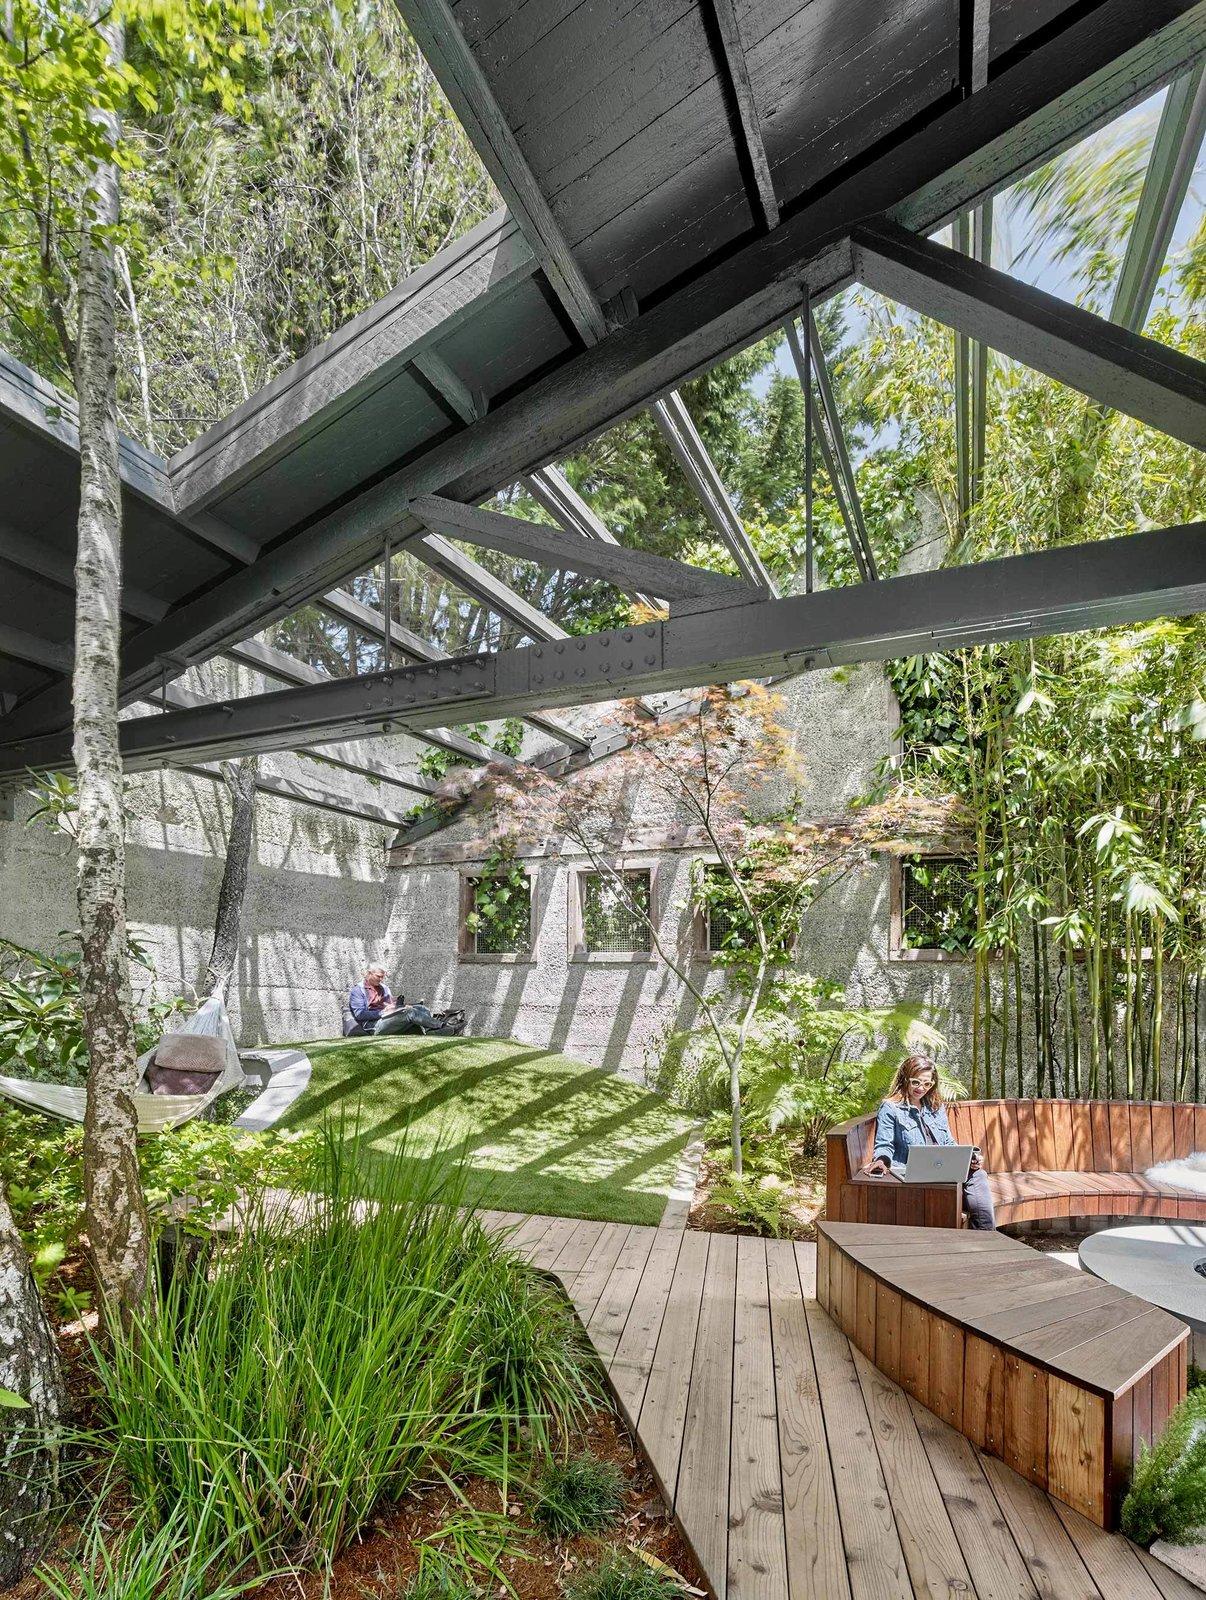 Outdoor, Grass, and Wood Patio, Porch, Deck  Humangear by SCULPT Gardens